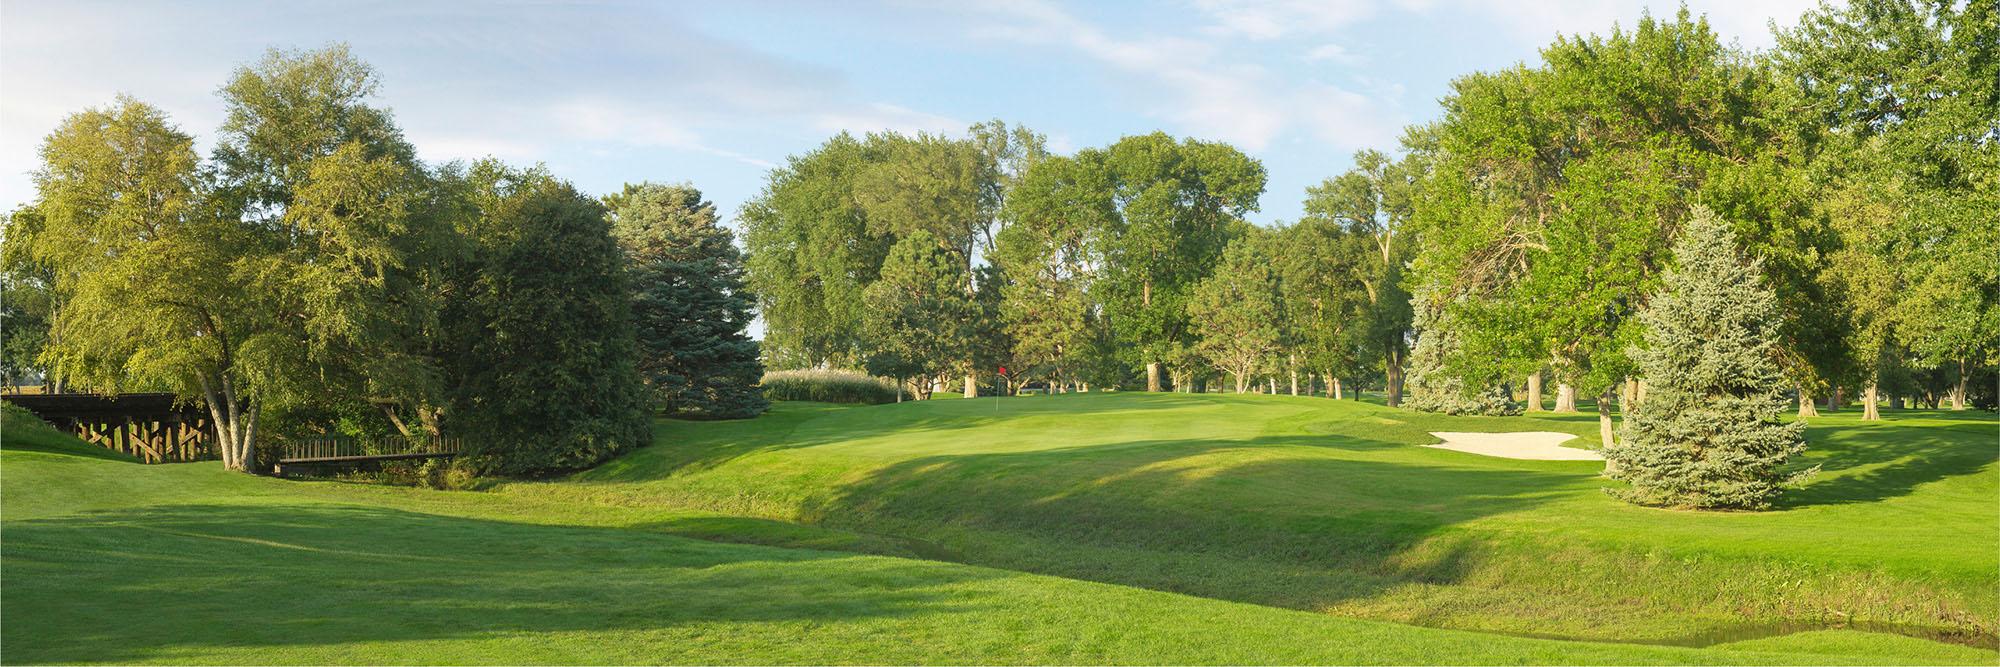 Golf Course Image - Fremont No. 3